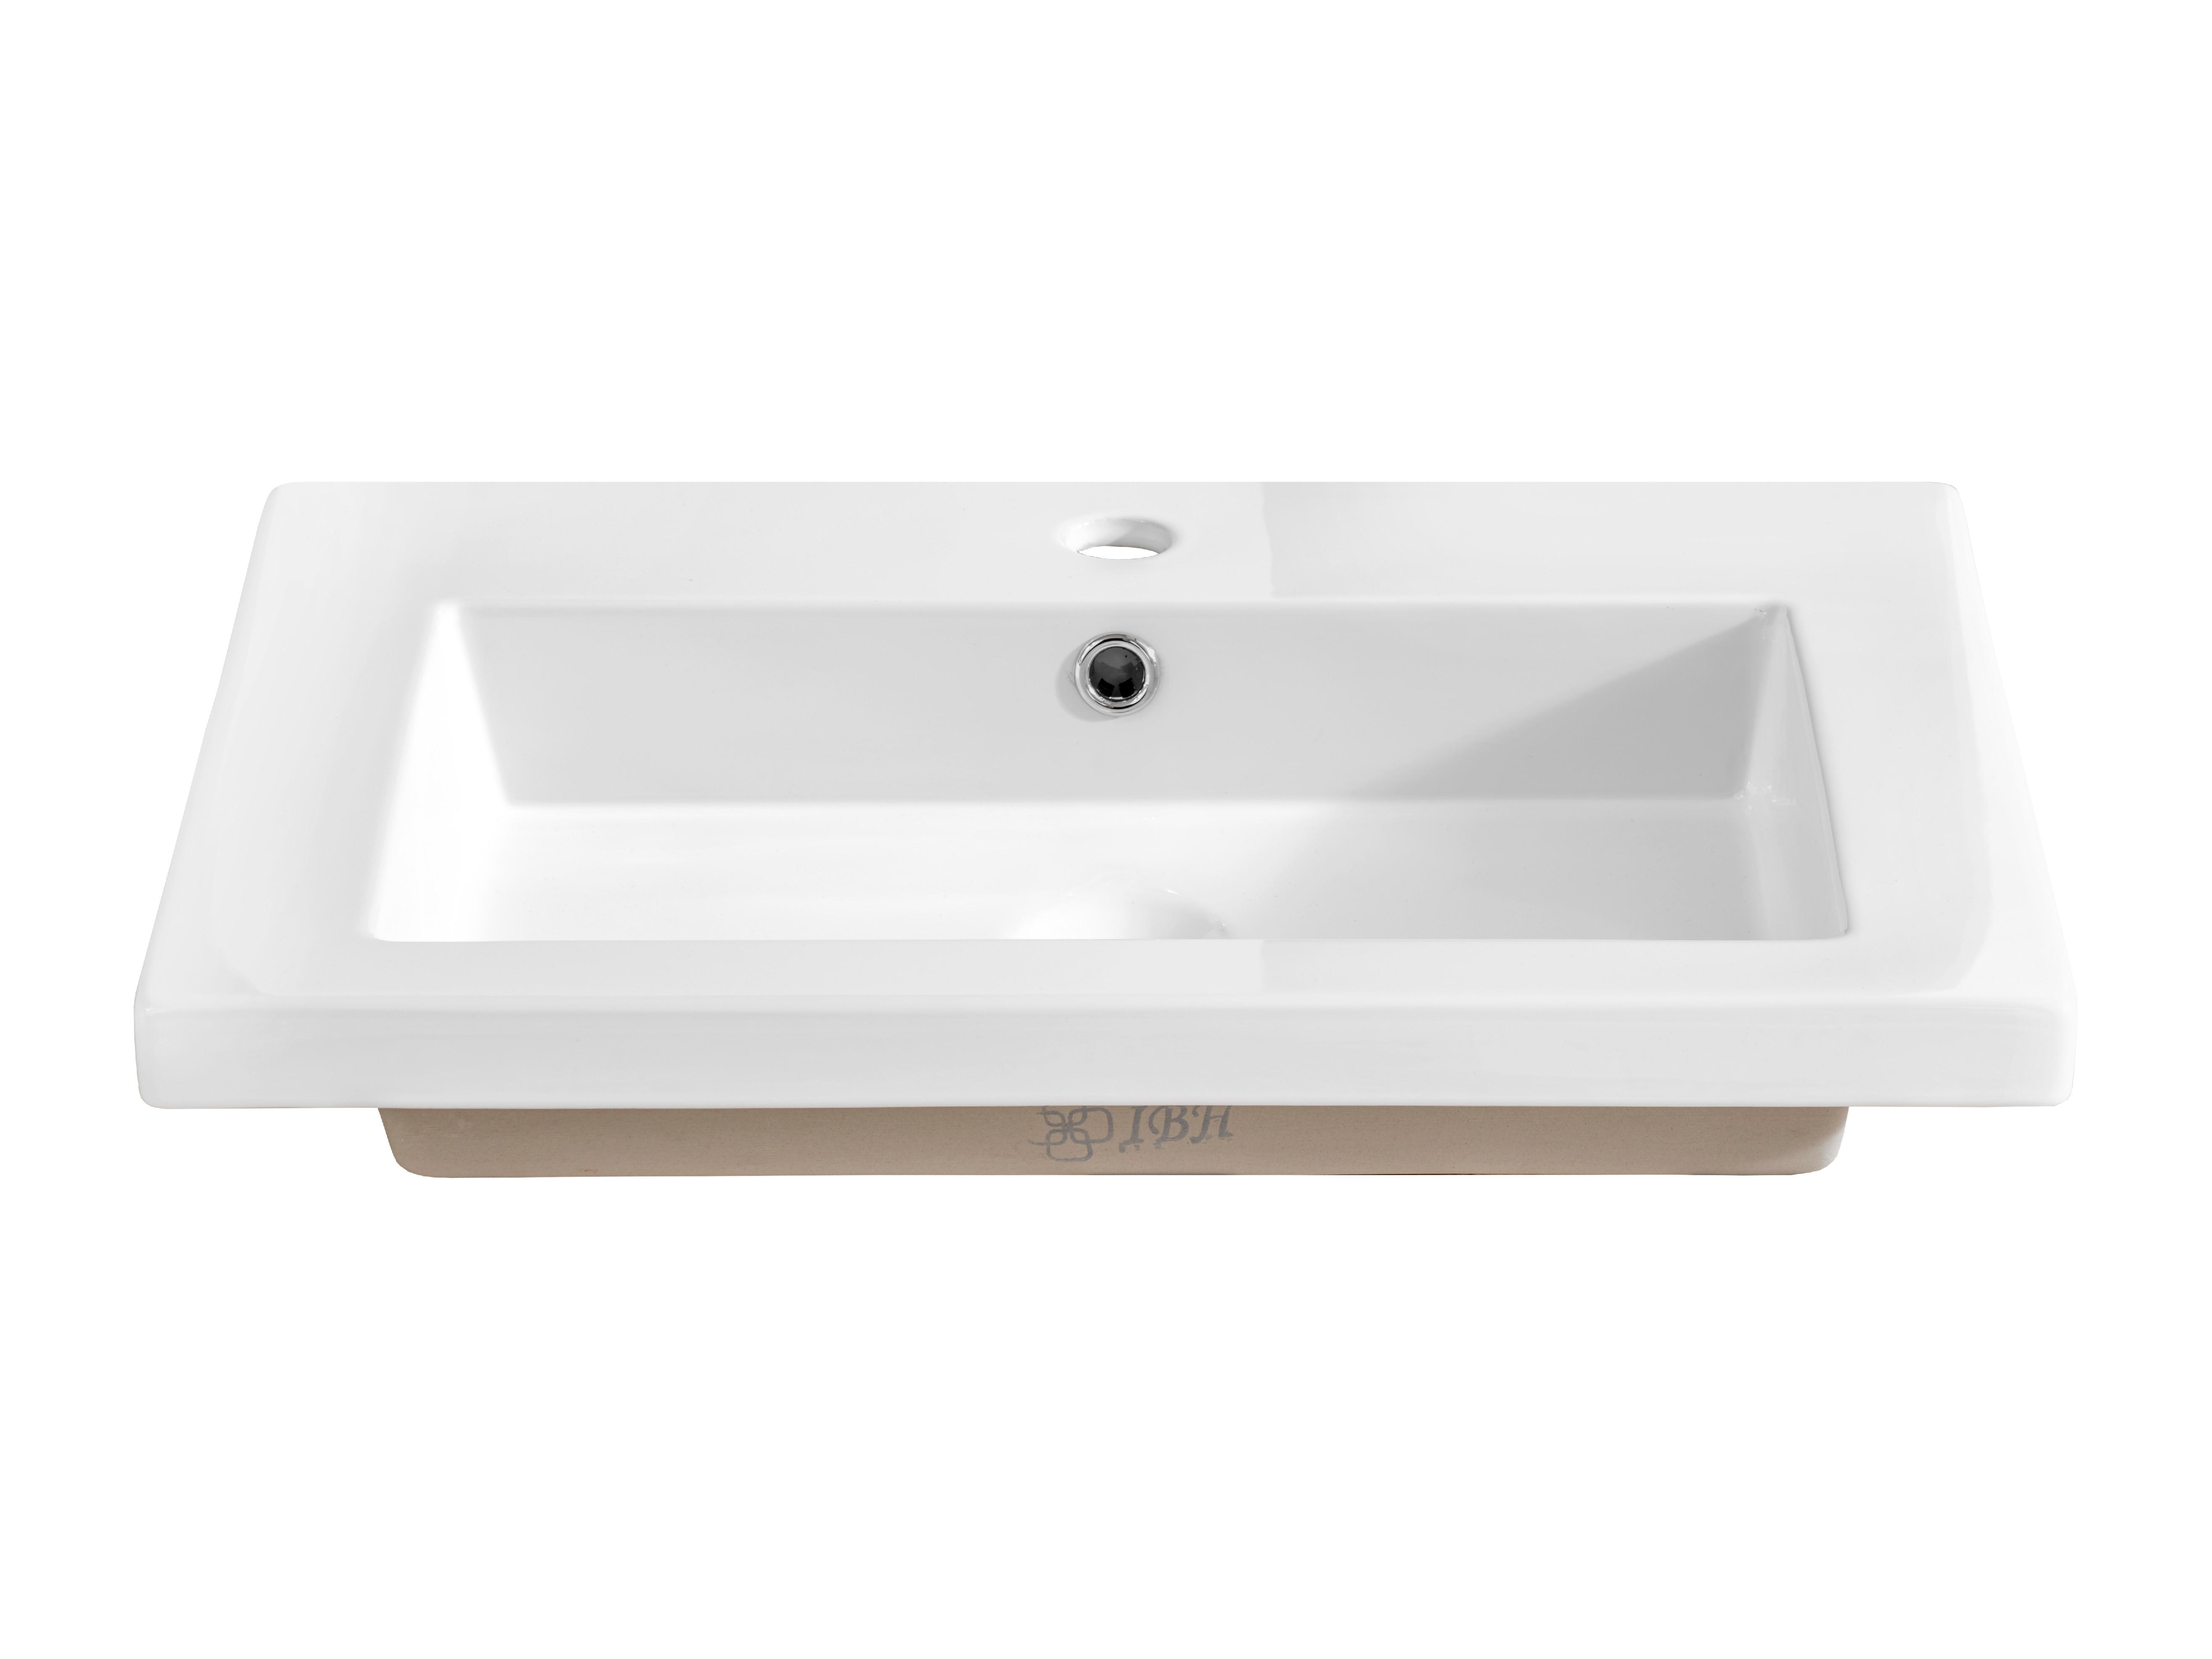 ArtCom Kúpeľňová zostava Capri   biela Capri   biela: Umývadlo Spirit 60 cm